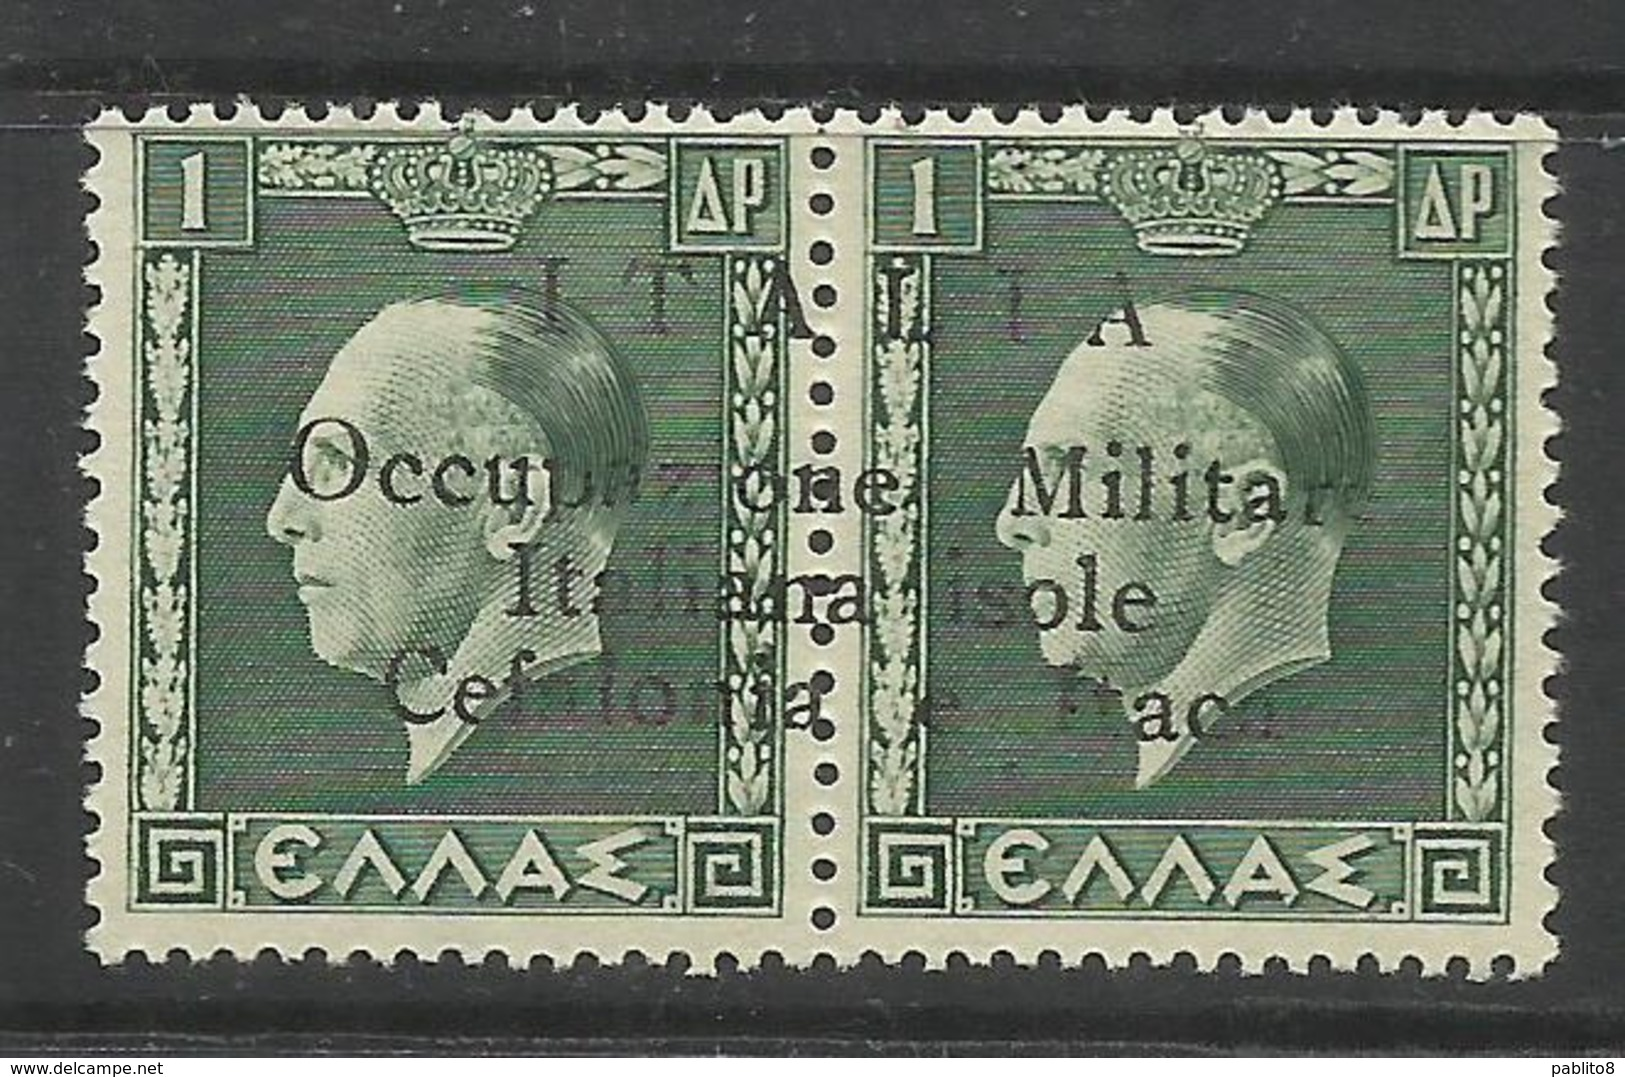 OCCUPAZIONE ITALIANA CEFALONIA E ITACA KEFALONIA ITHACA 1941 KING GEORGE II RE GIORGIO 1 D + 1 D MNH FIRMATO SIGNED - 9. Occupazione 2a Guerra (Italia)